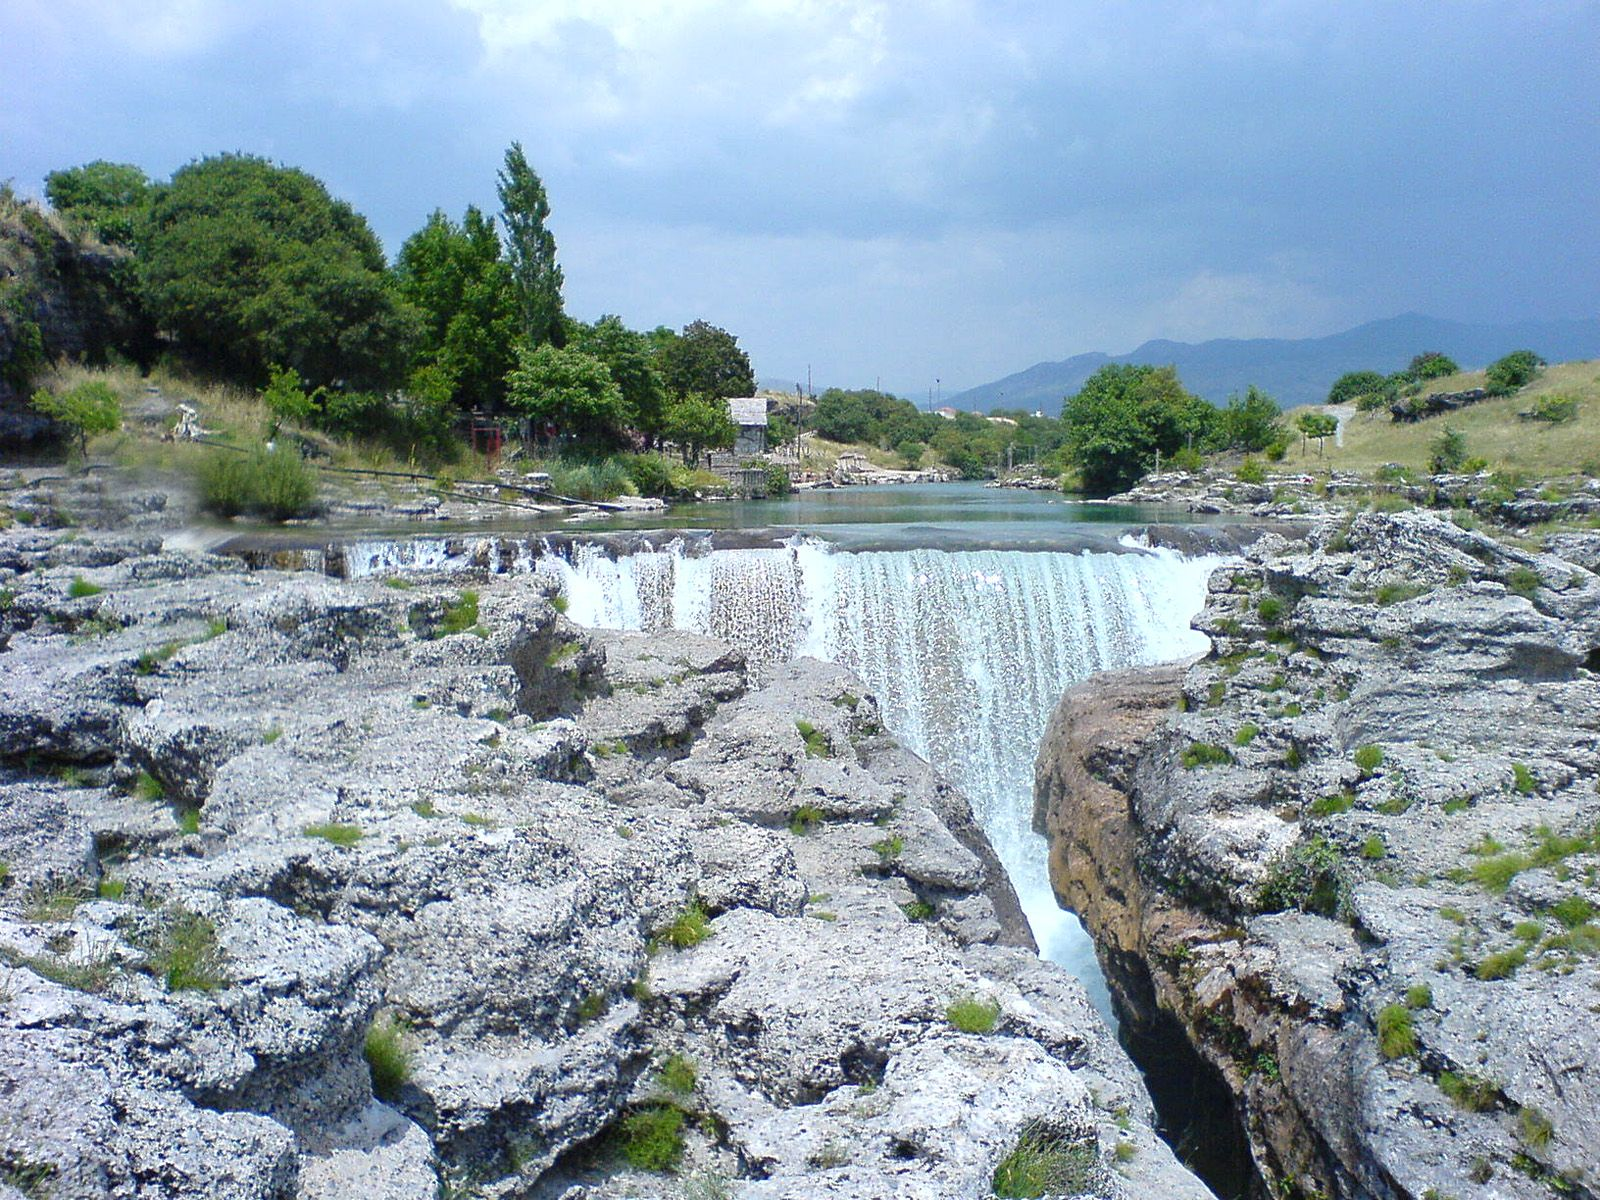 Водопад Ниагара на реке Циевна сверху